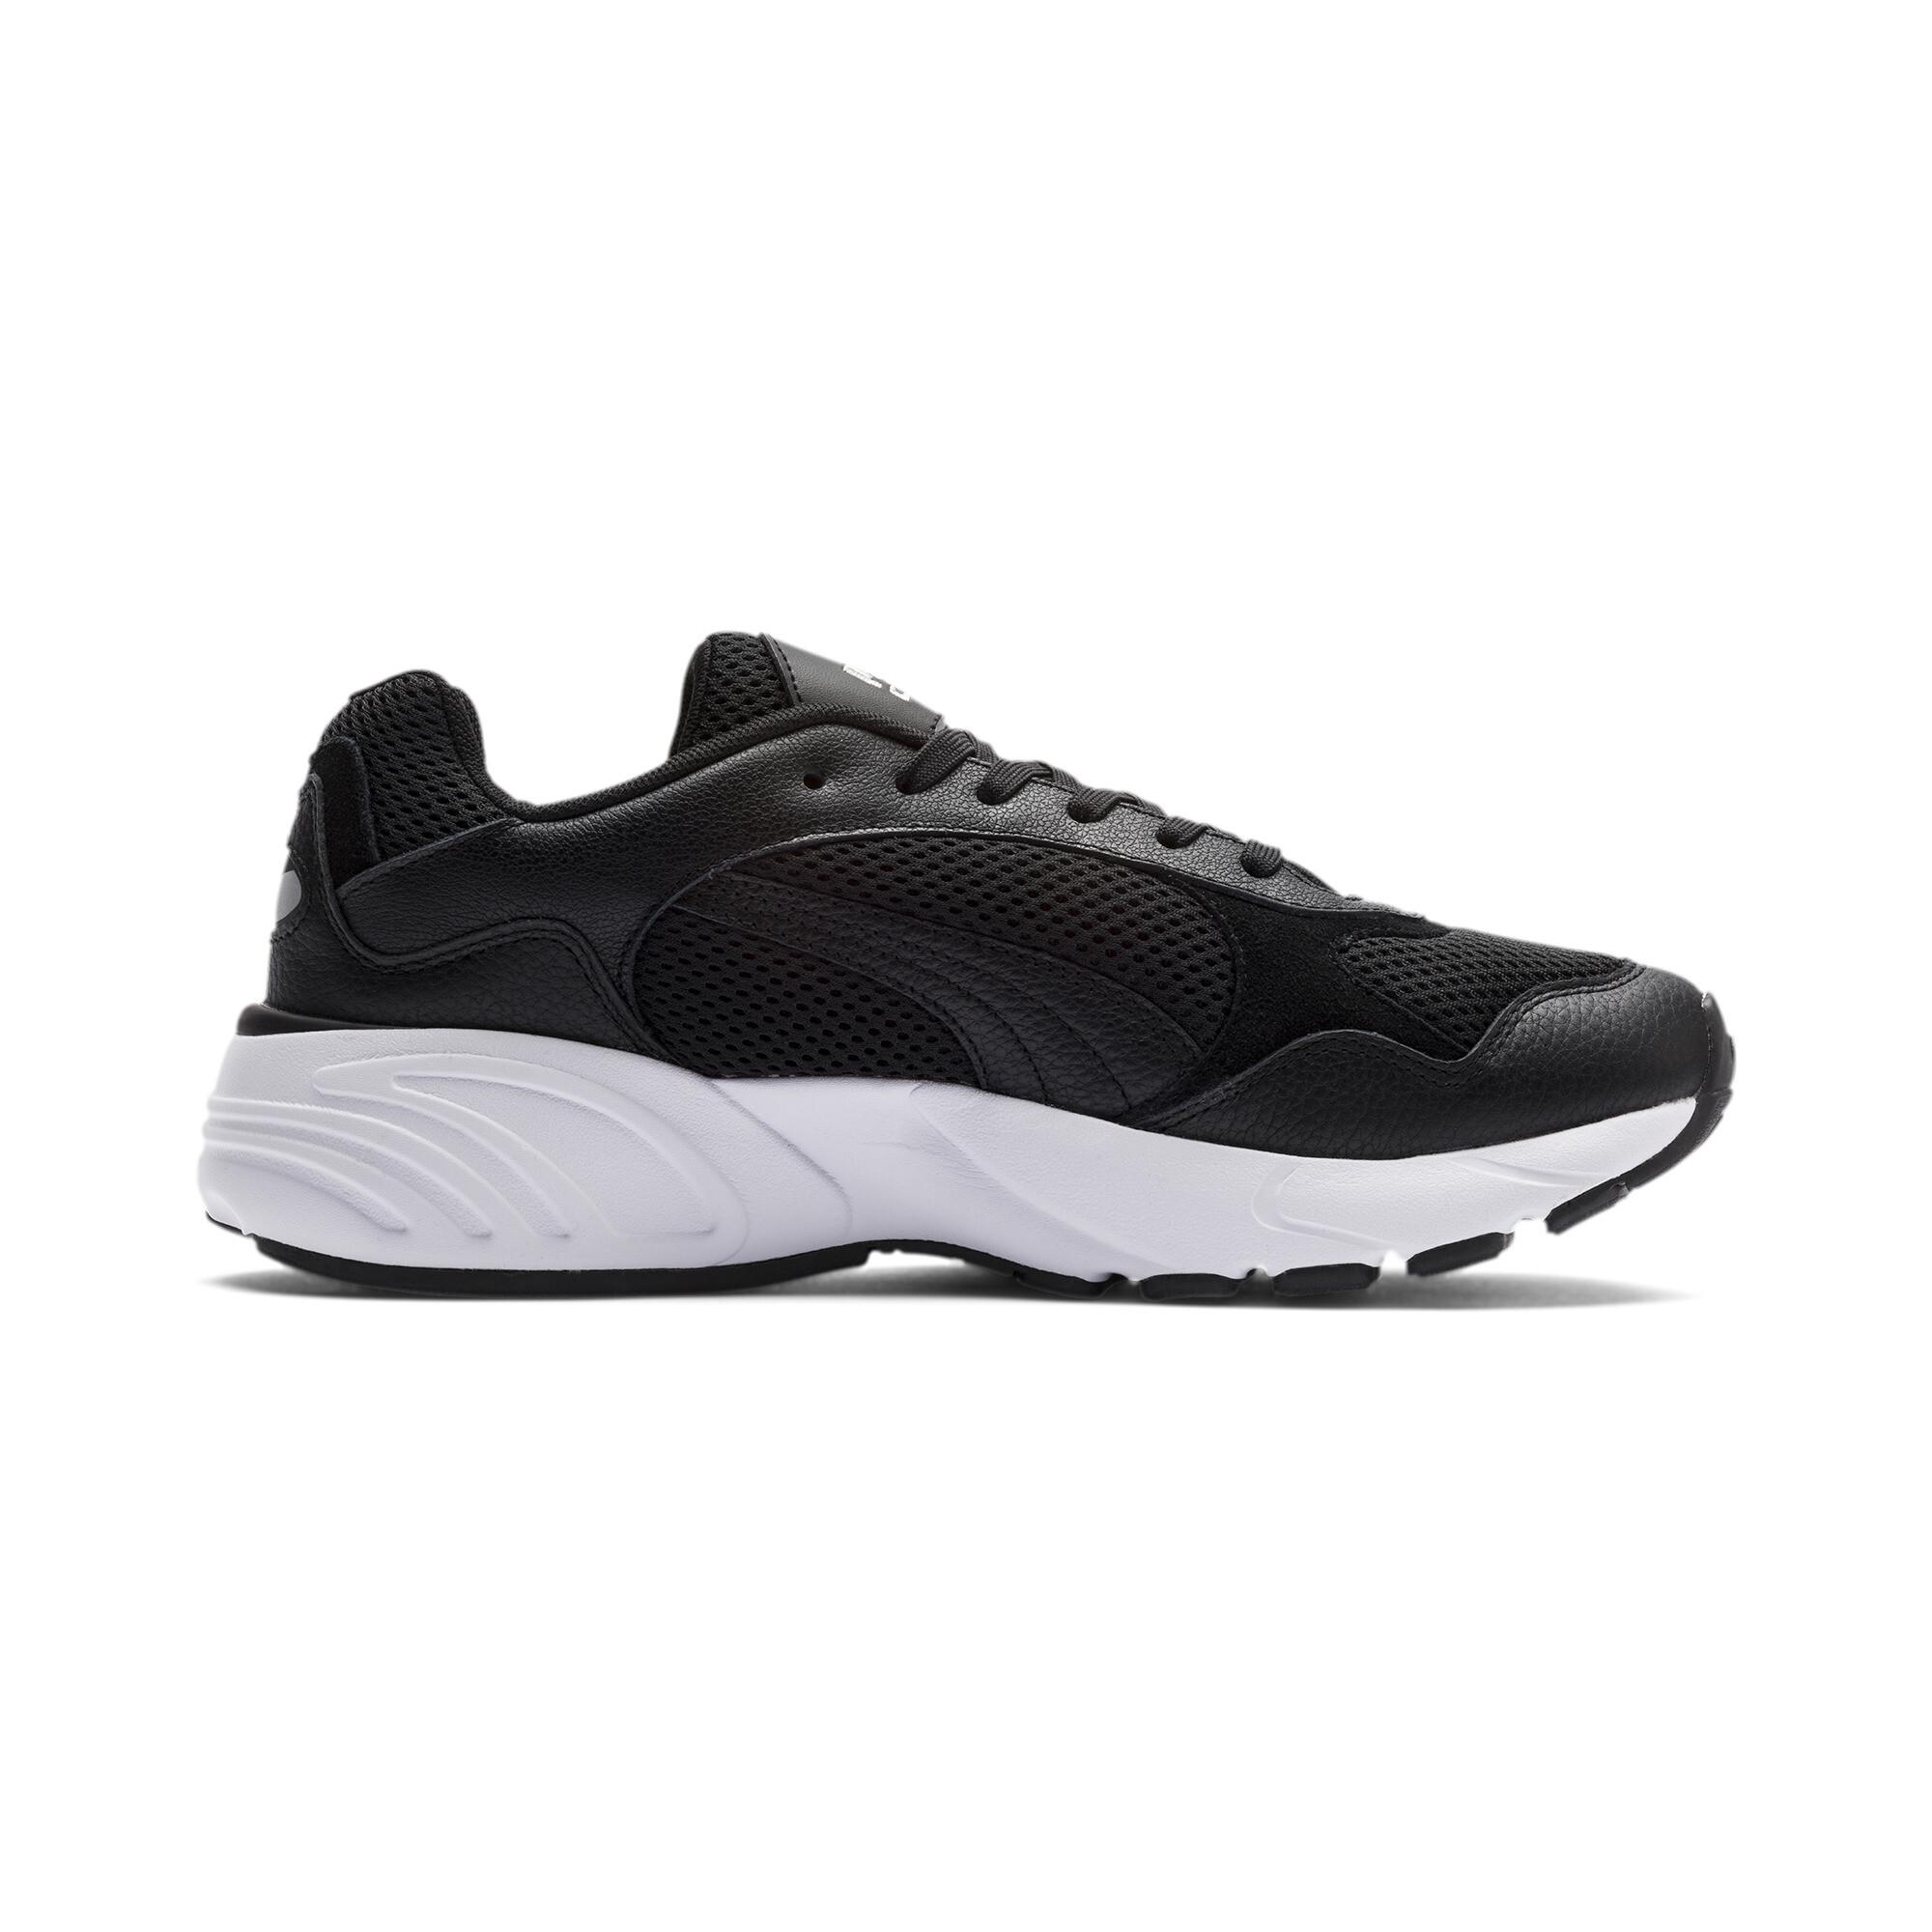 Indexbild 6 - PUMA CELL Viper Leather Sneaker Unisex Schuhe Sport Classics Neu